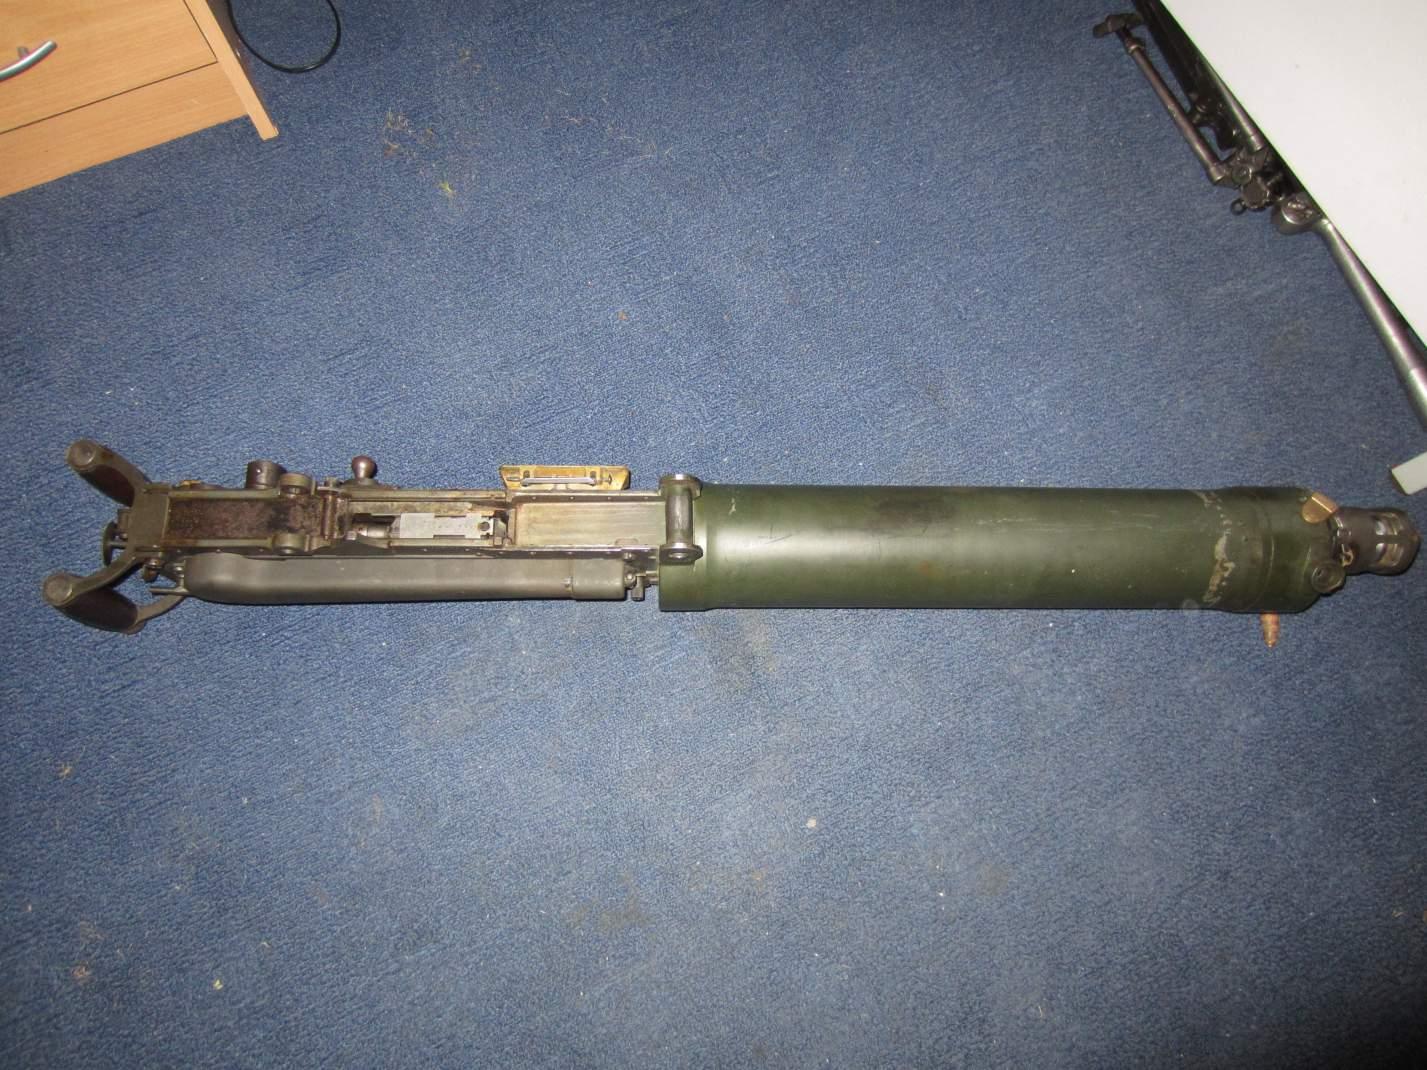 medium machine gun